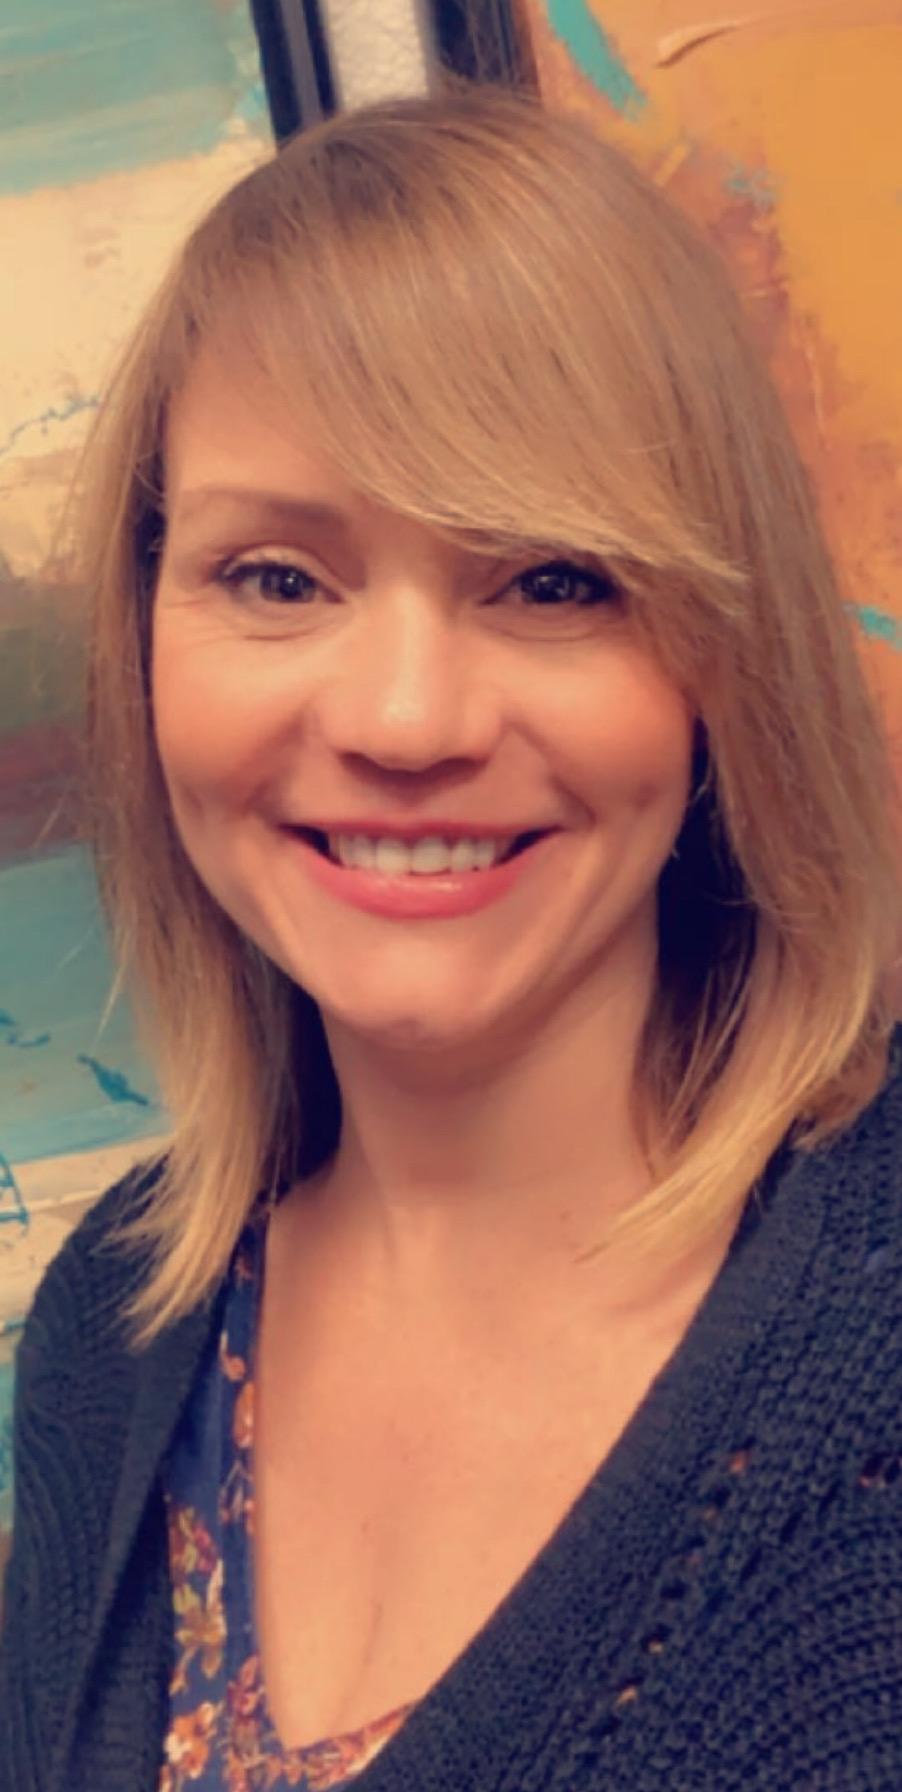 Chrissy Denson